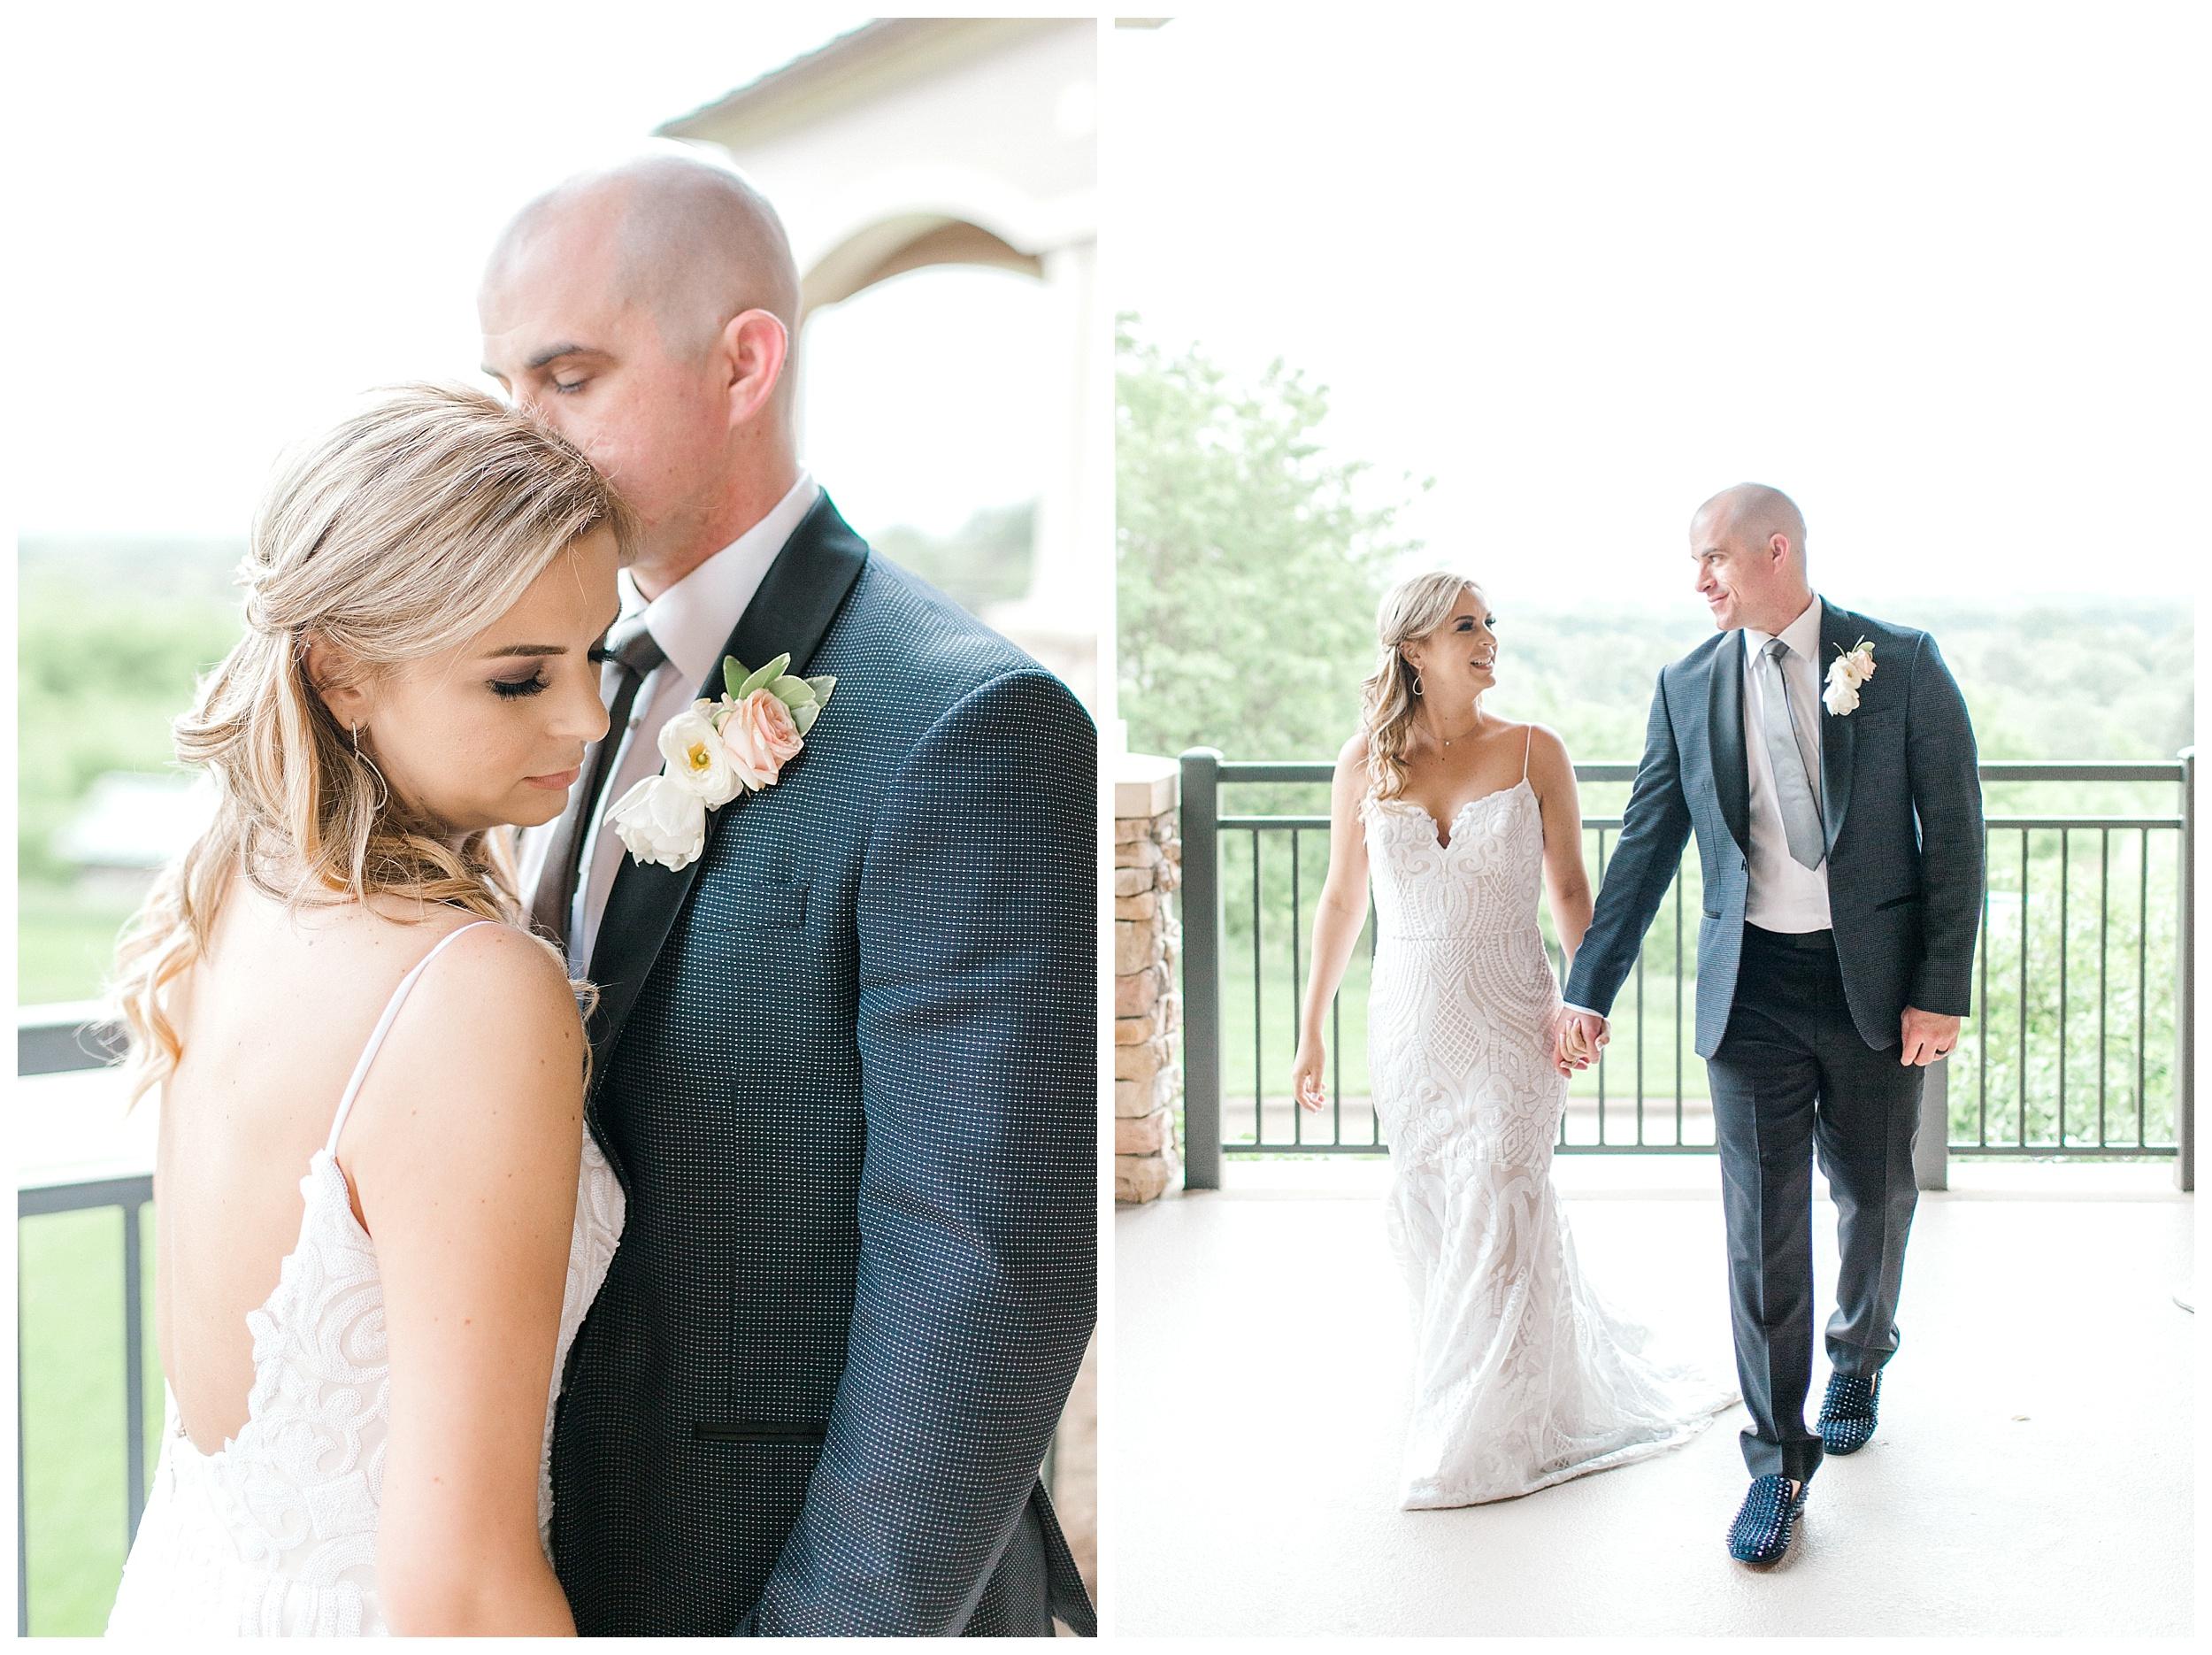 Lansdowne Resort Wedding | Virginia Film Wedding Photographer Kir Tuben_0062.jpg